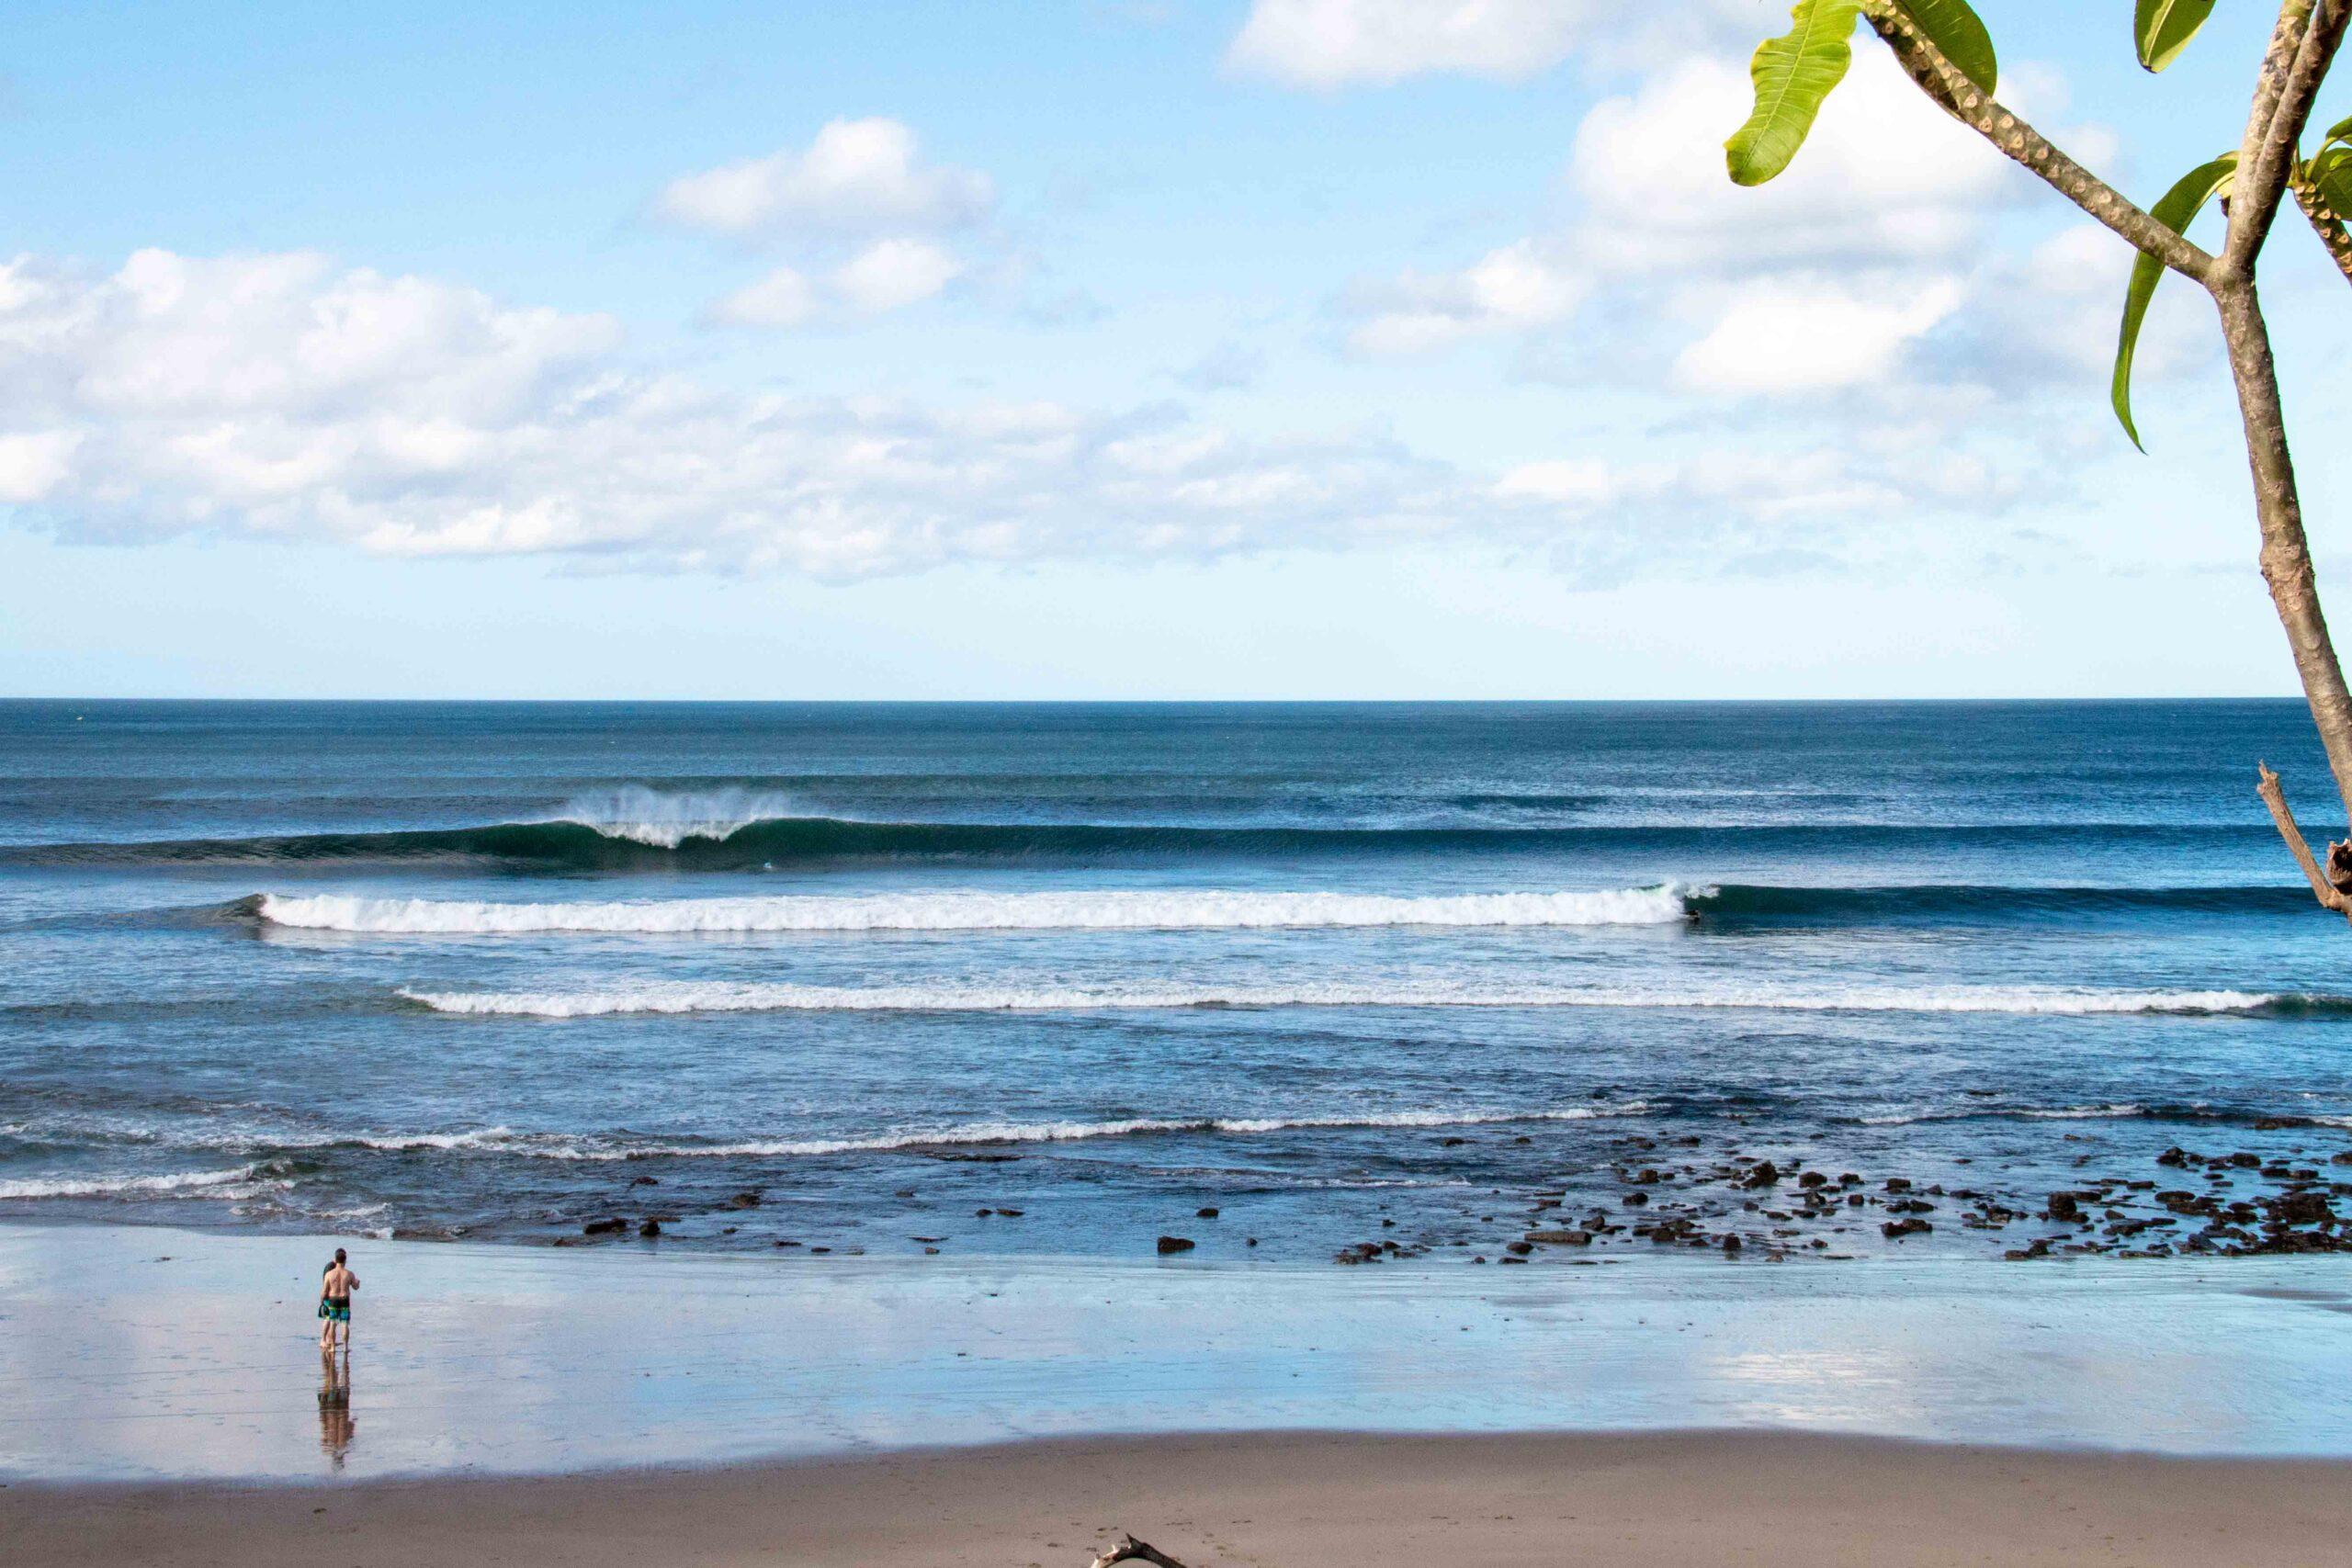 Popoyo surf in Nicargua